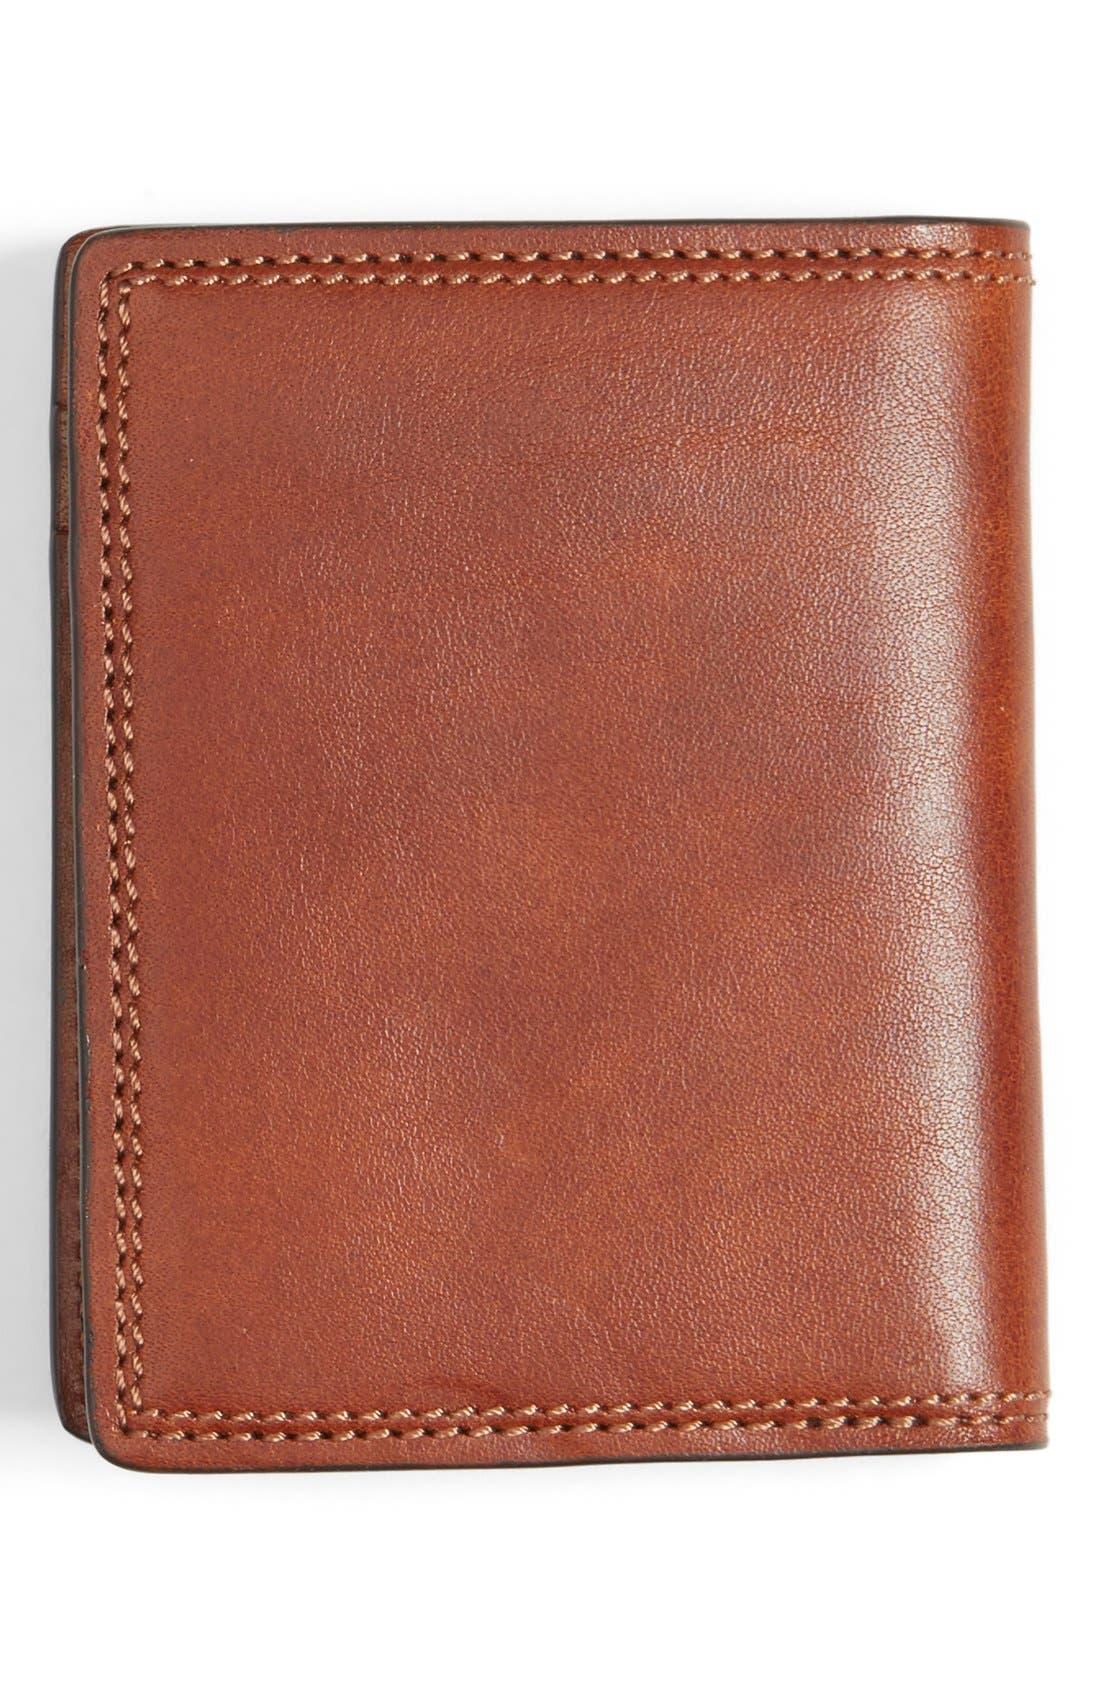 Leather Front Pocket Money Clip Wallet,                             Alternate thumbnail 3, color,                             Amber